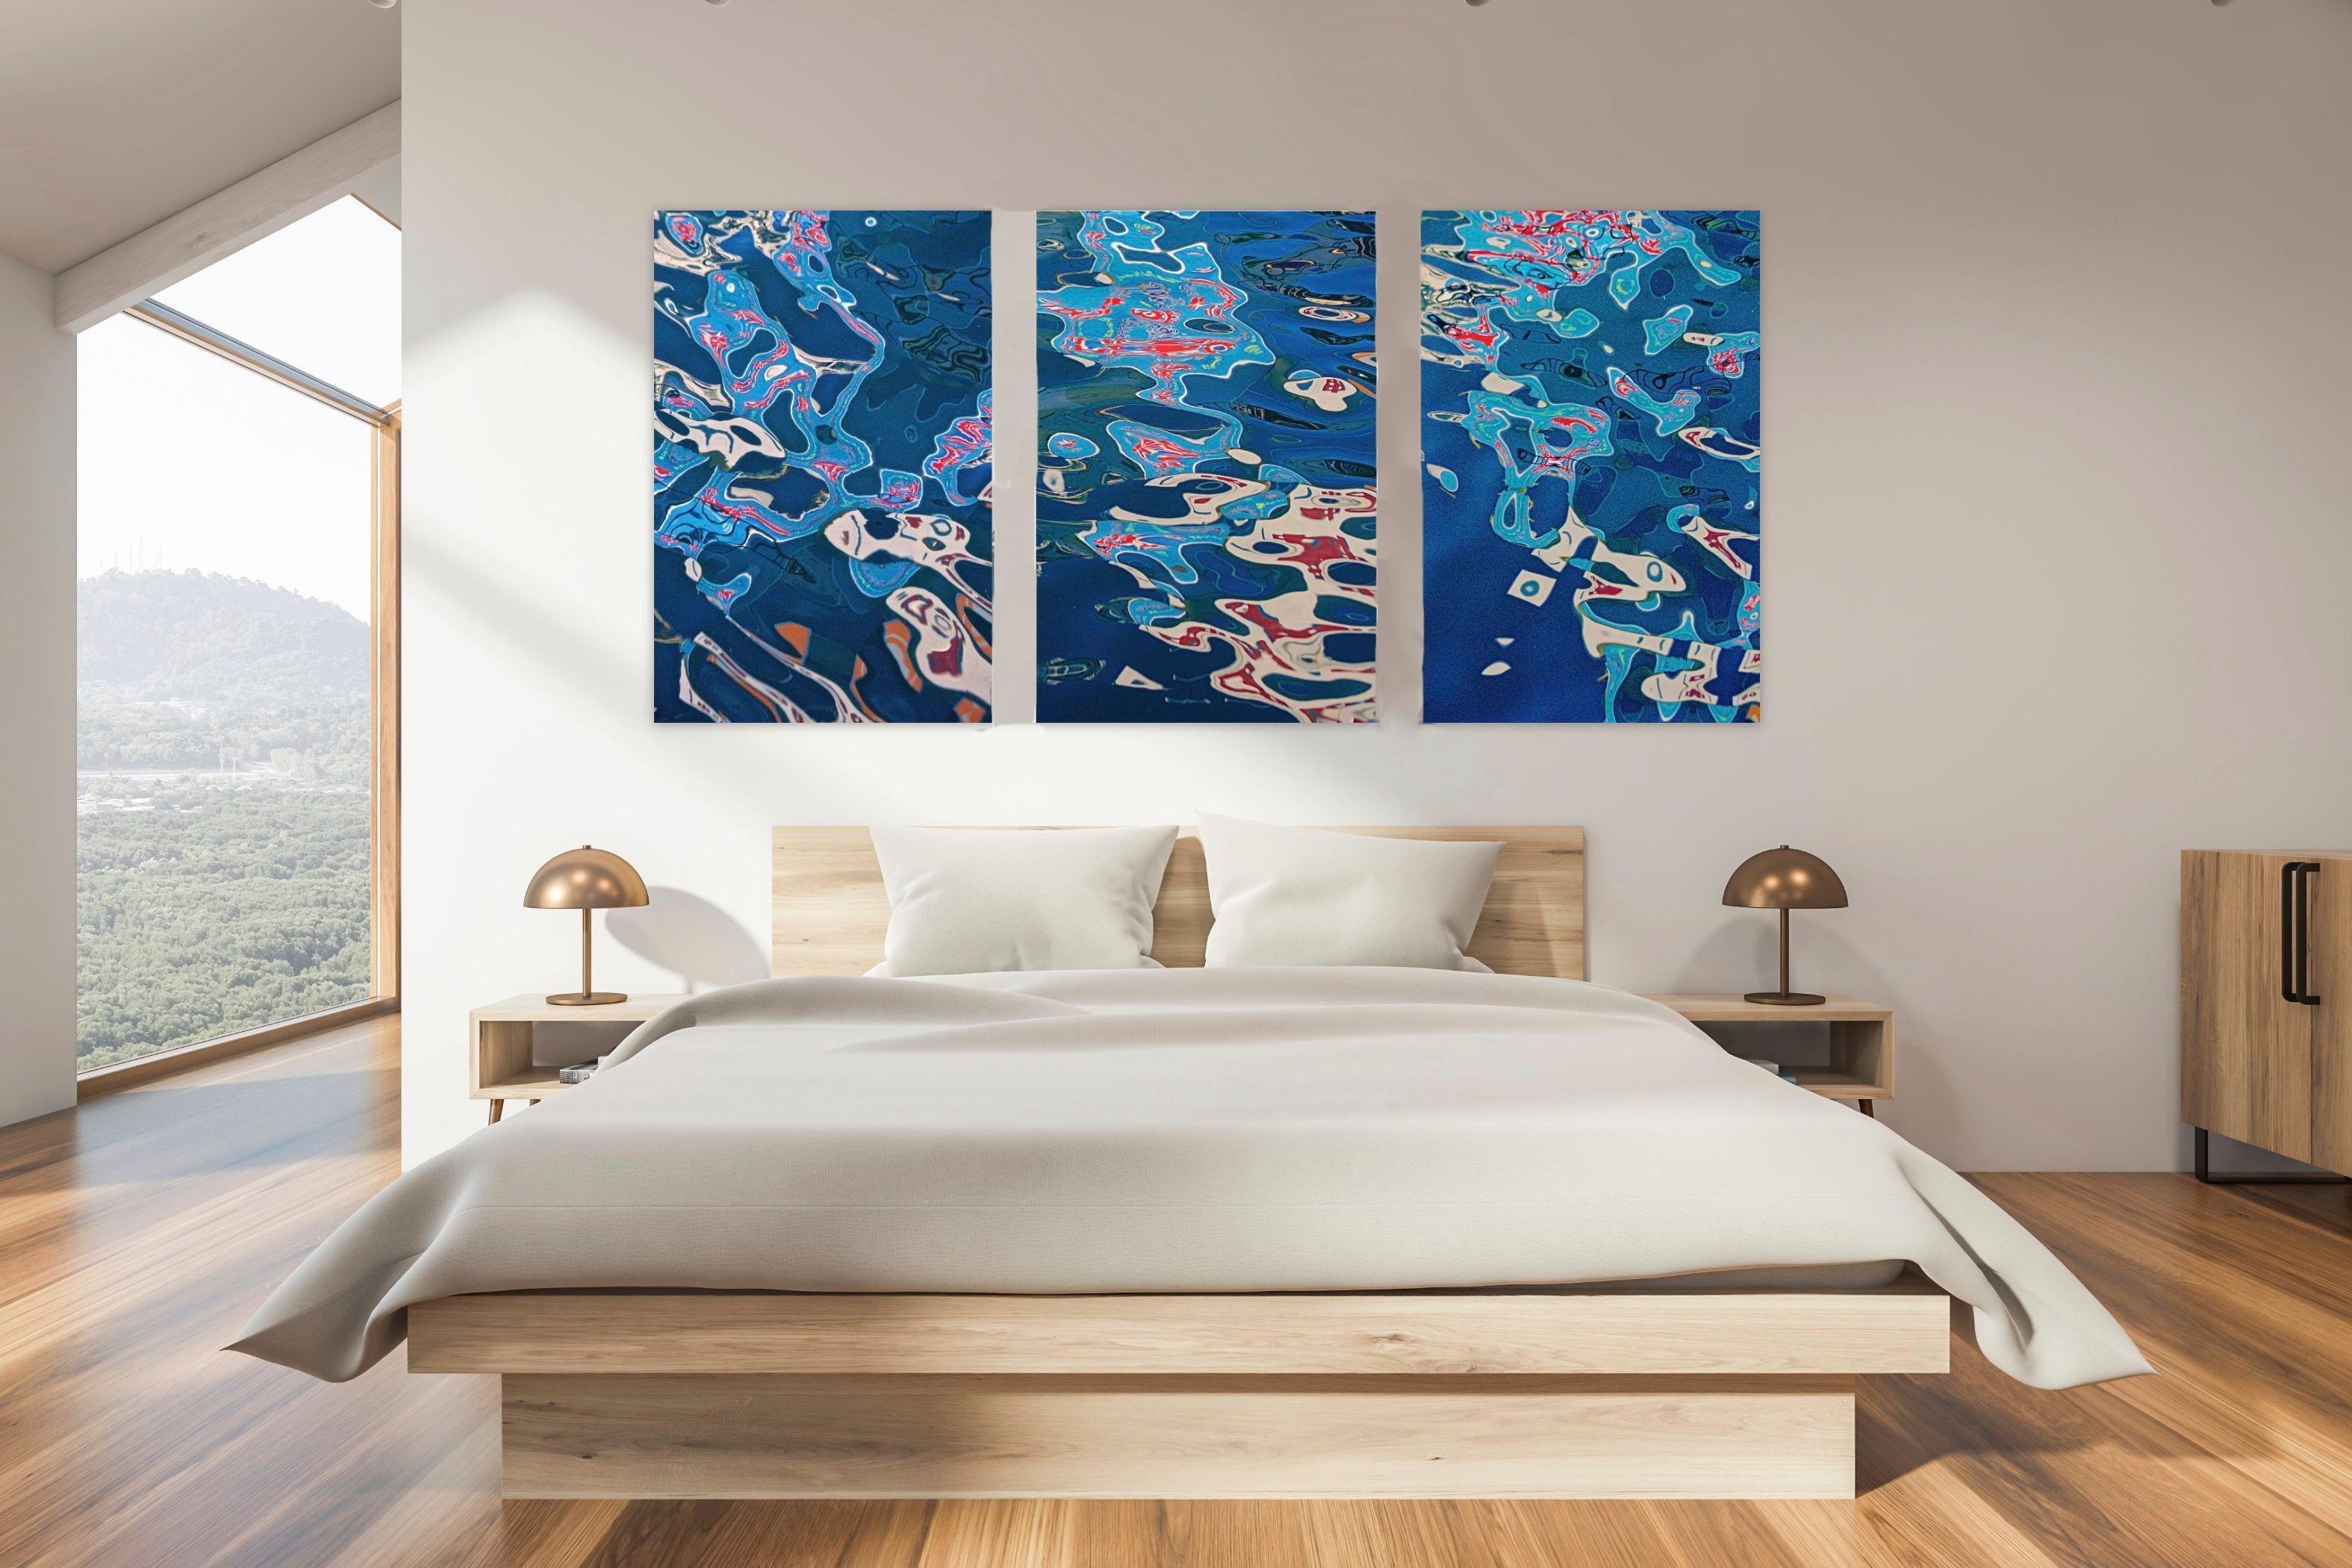 Kabuki Triptych - Archival Pigment Print mounted on Plexiglass Ltd Ed 1/5